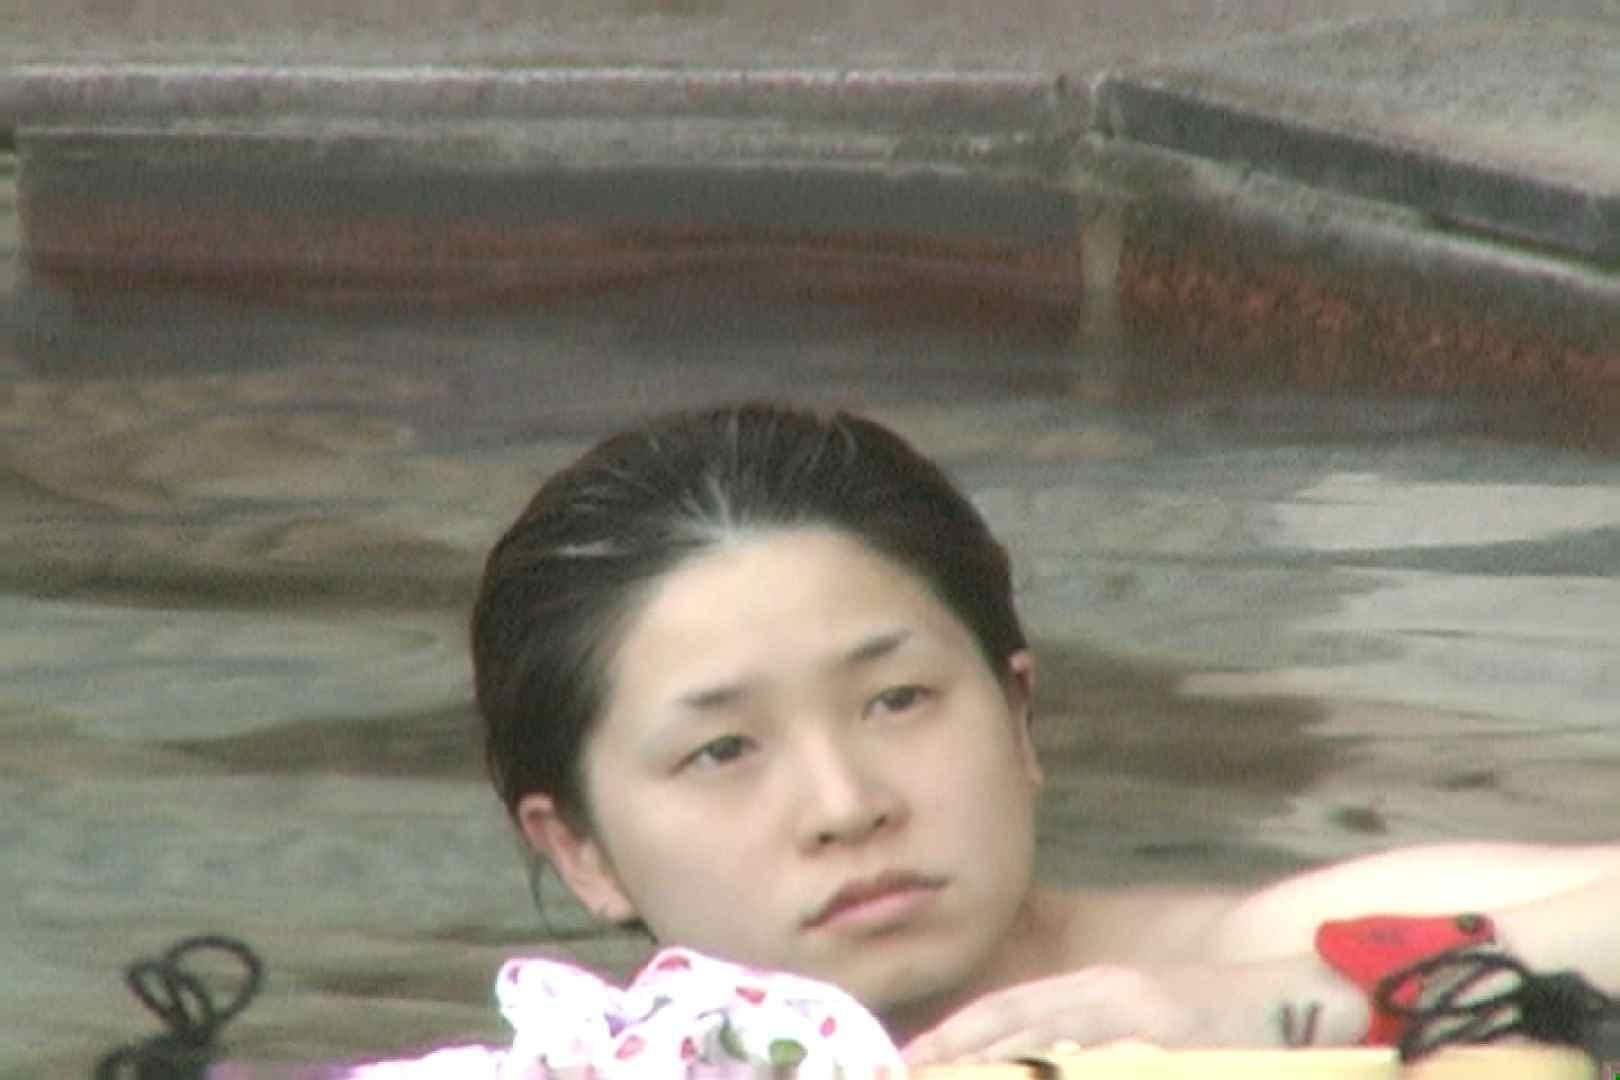 Aquaな露天風呂Vol.628 0 | 0  90連発 31